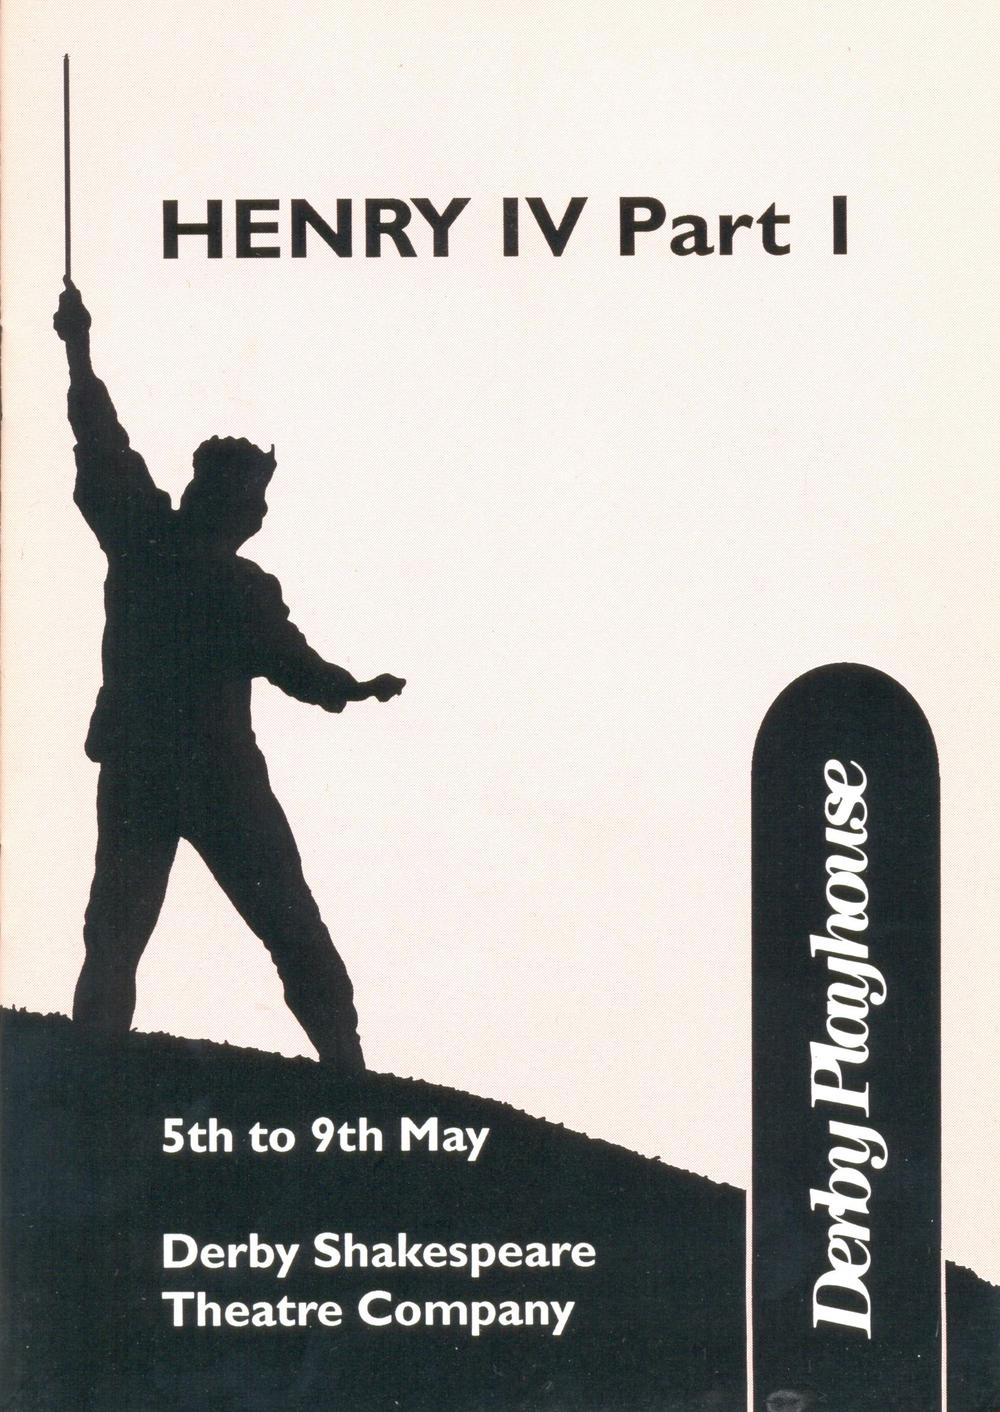 'Henry IV (Pat I)' 1992